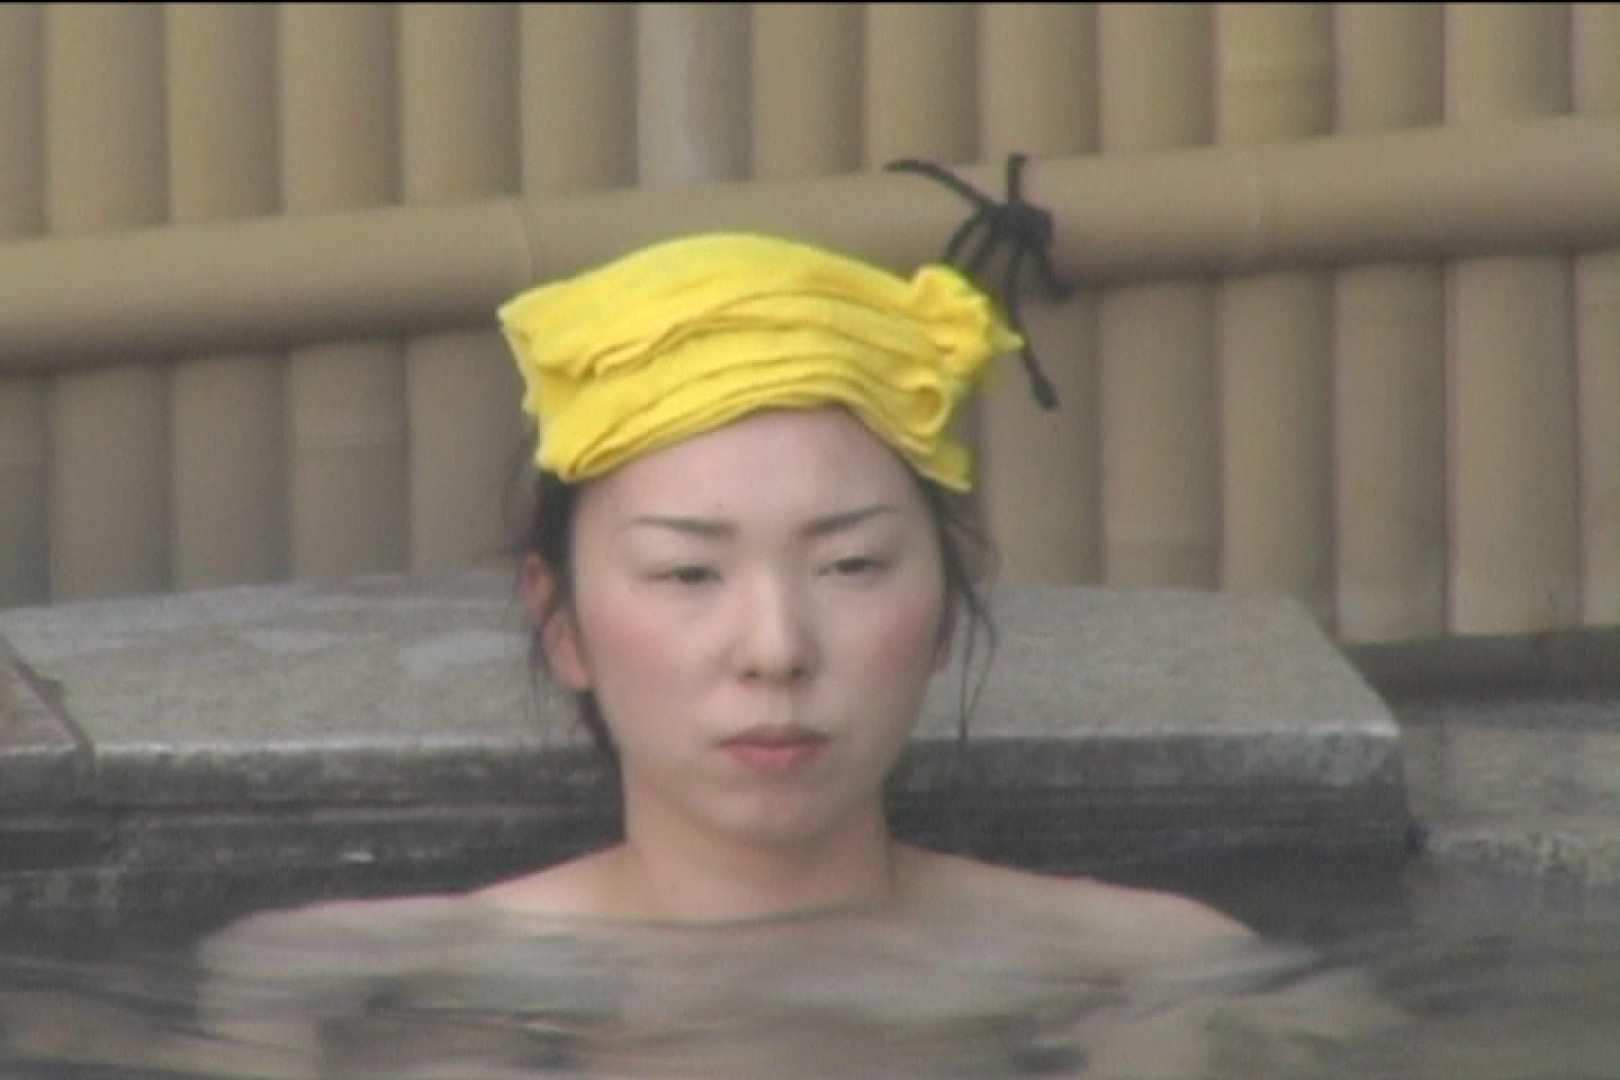 Aquaな露天風呂Vol.529 盗撮シリーズ | 露天風呂編  106PIX 29